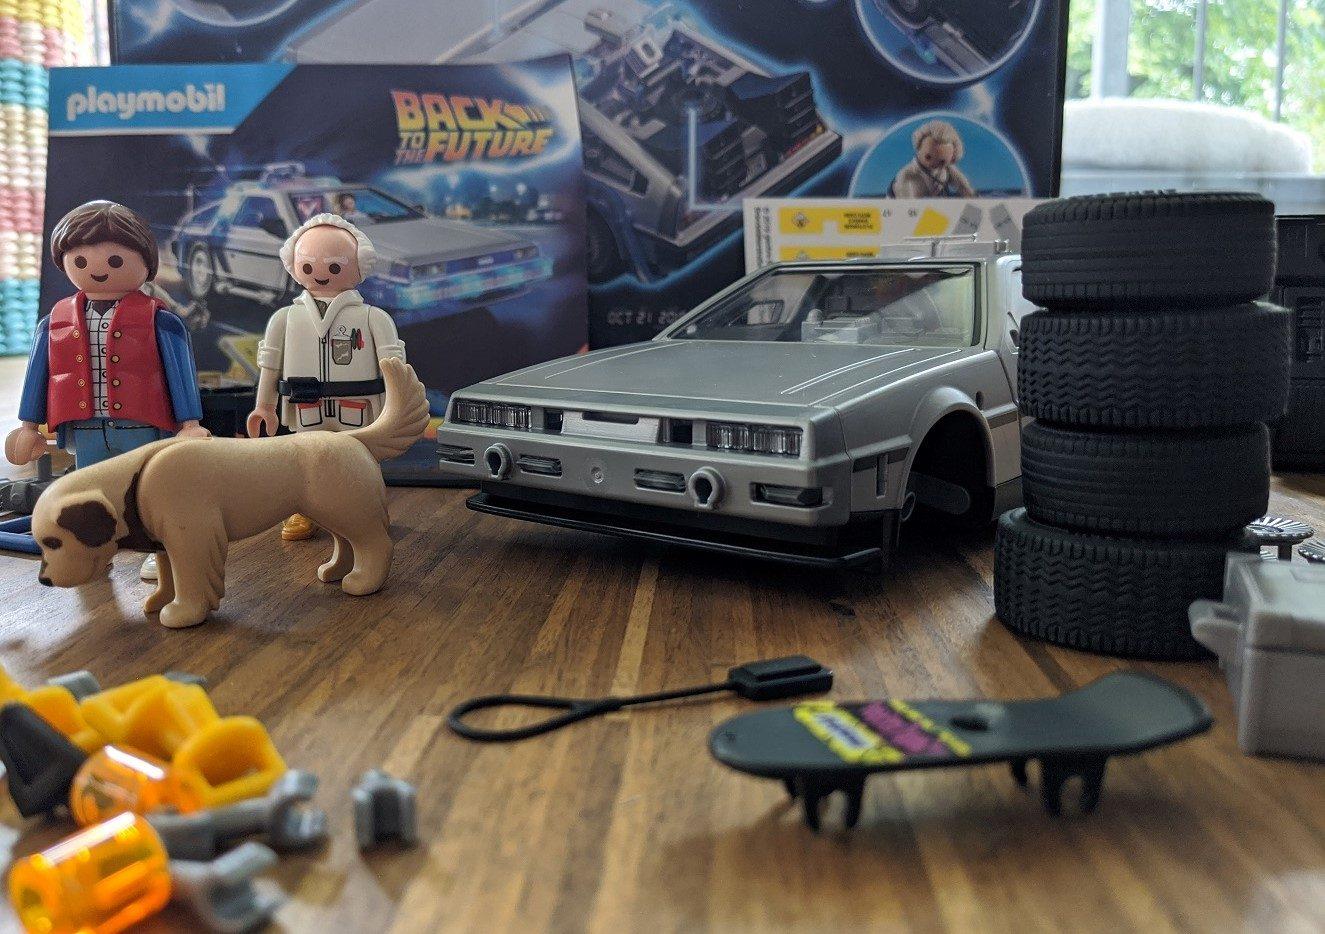 playmobil DeLorean DMC 12